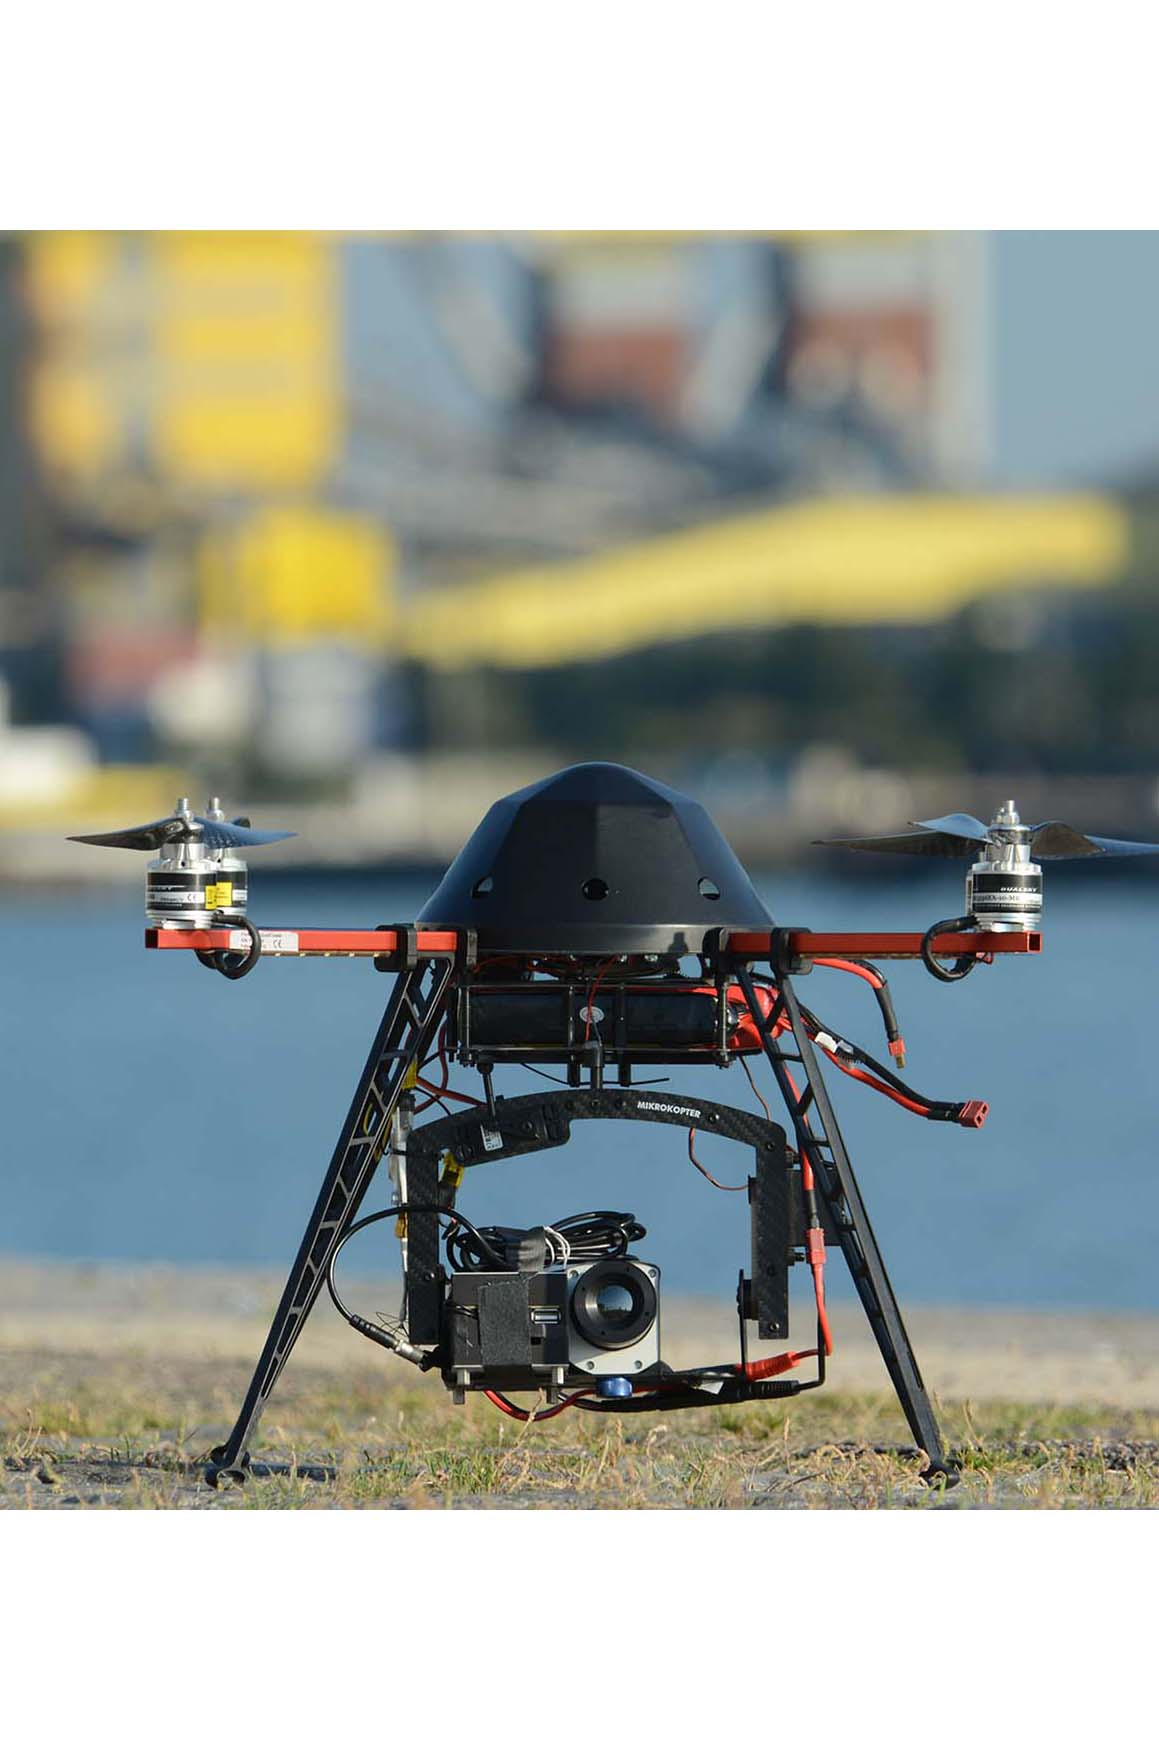 inspection-thermique-aerienne-drone-quadricopter-technivue